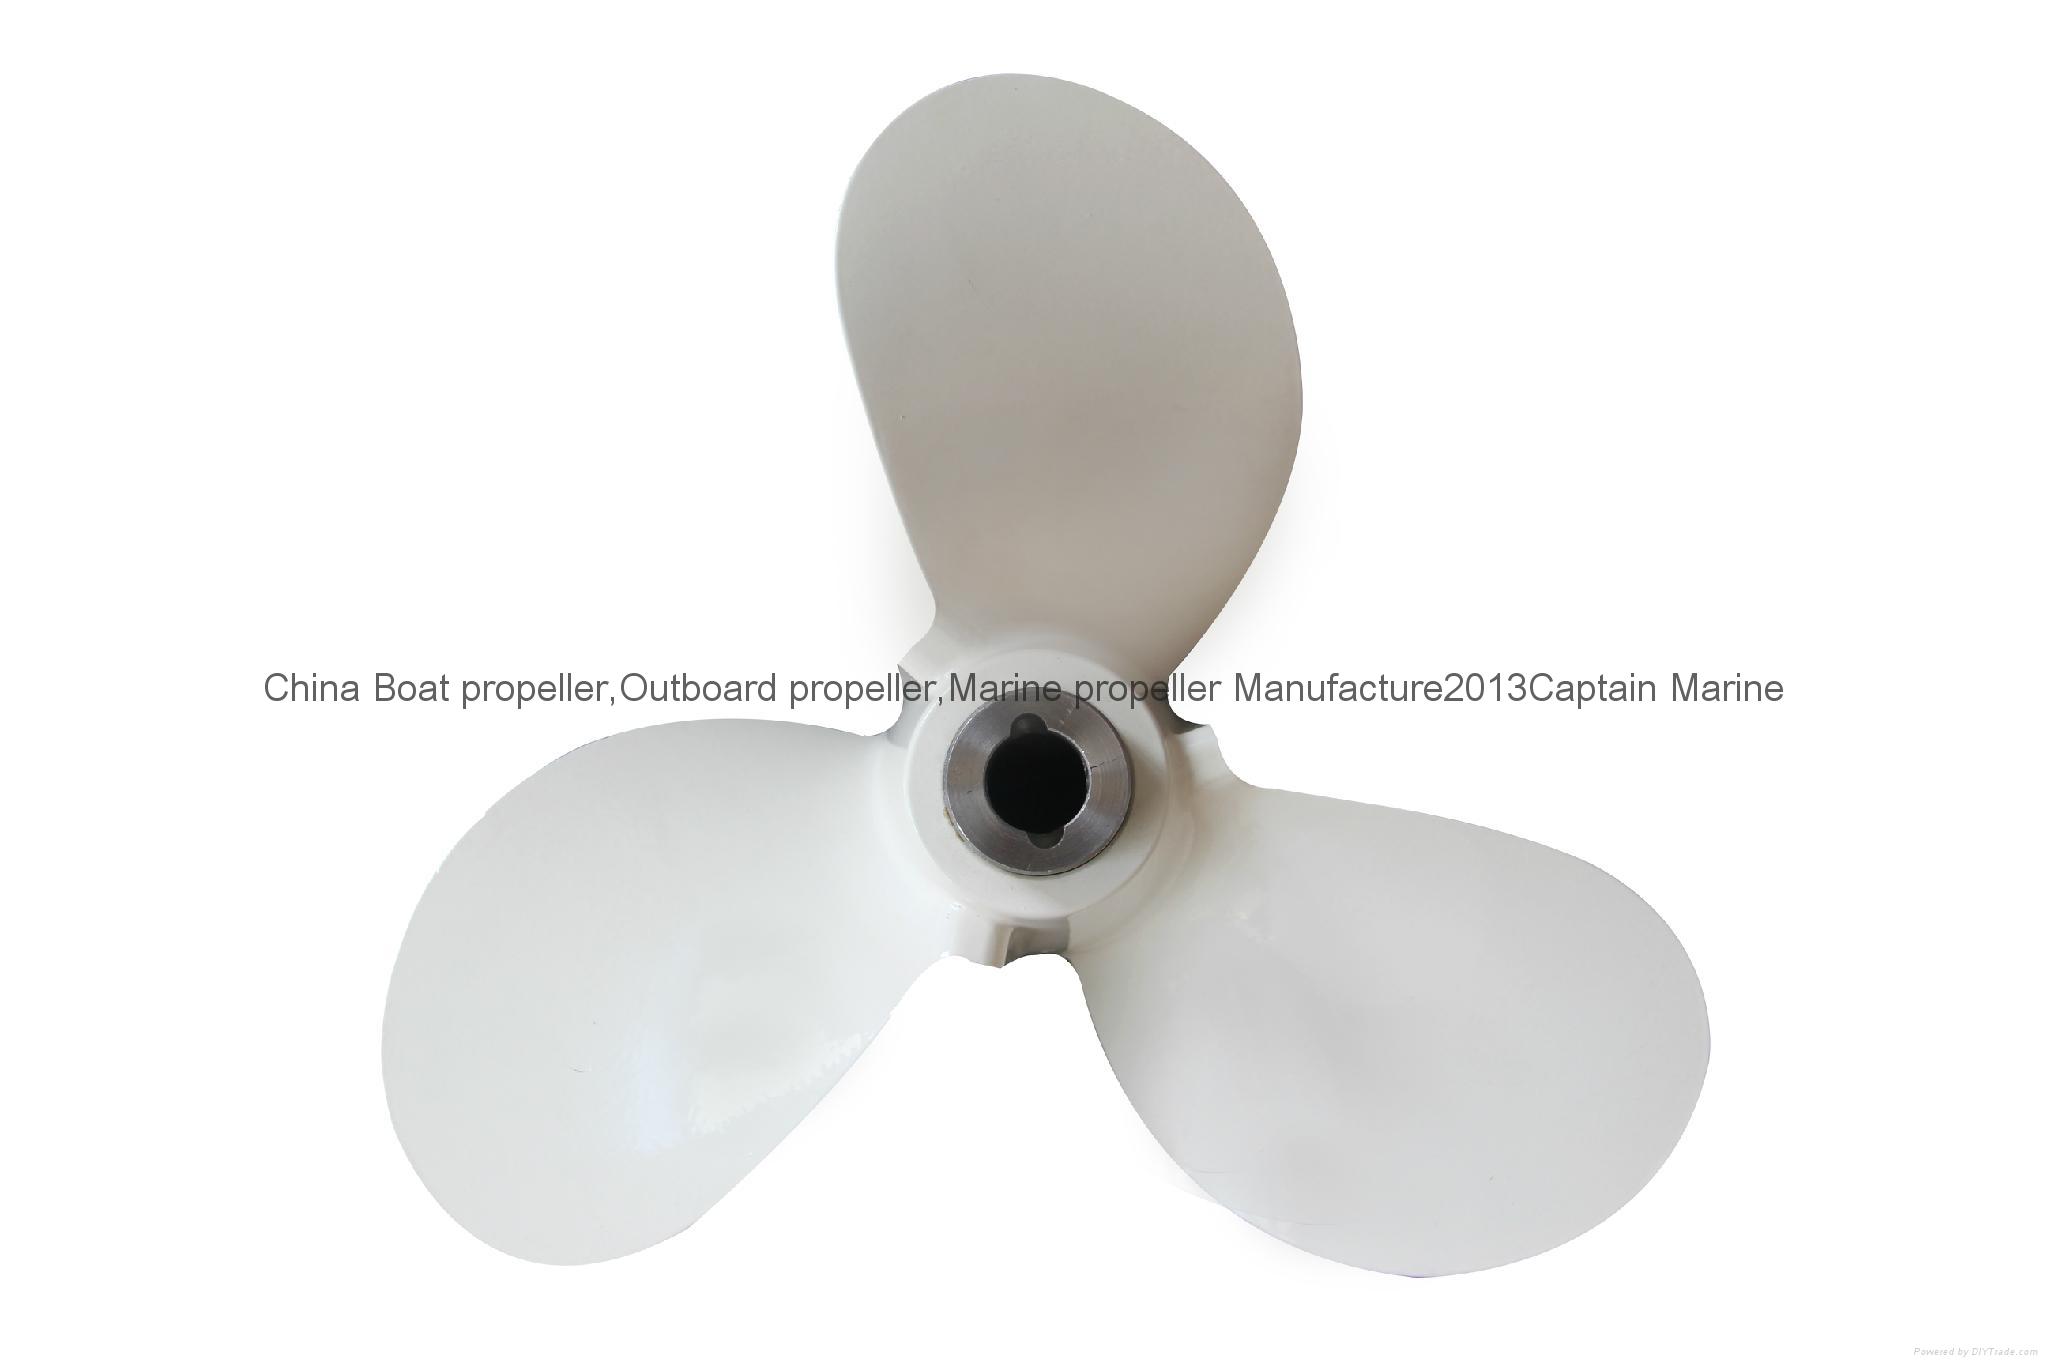 3 Blades Aluminum Alloy propeller for YAMAHA Motor 85HP-115HP  13 1/4 x 17 4